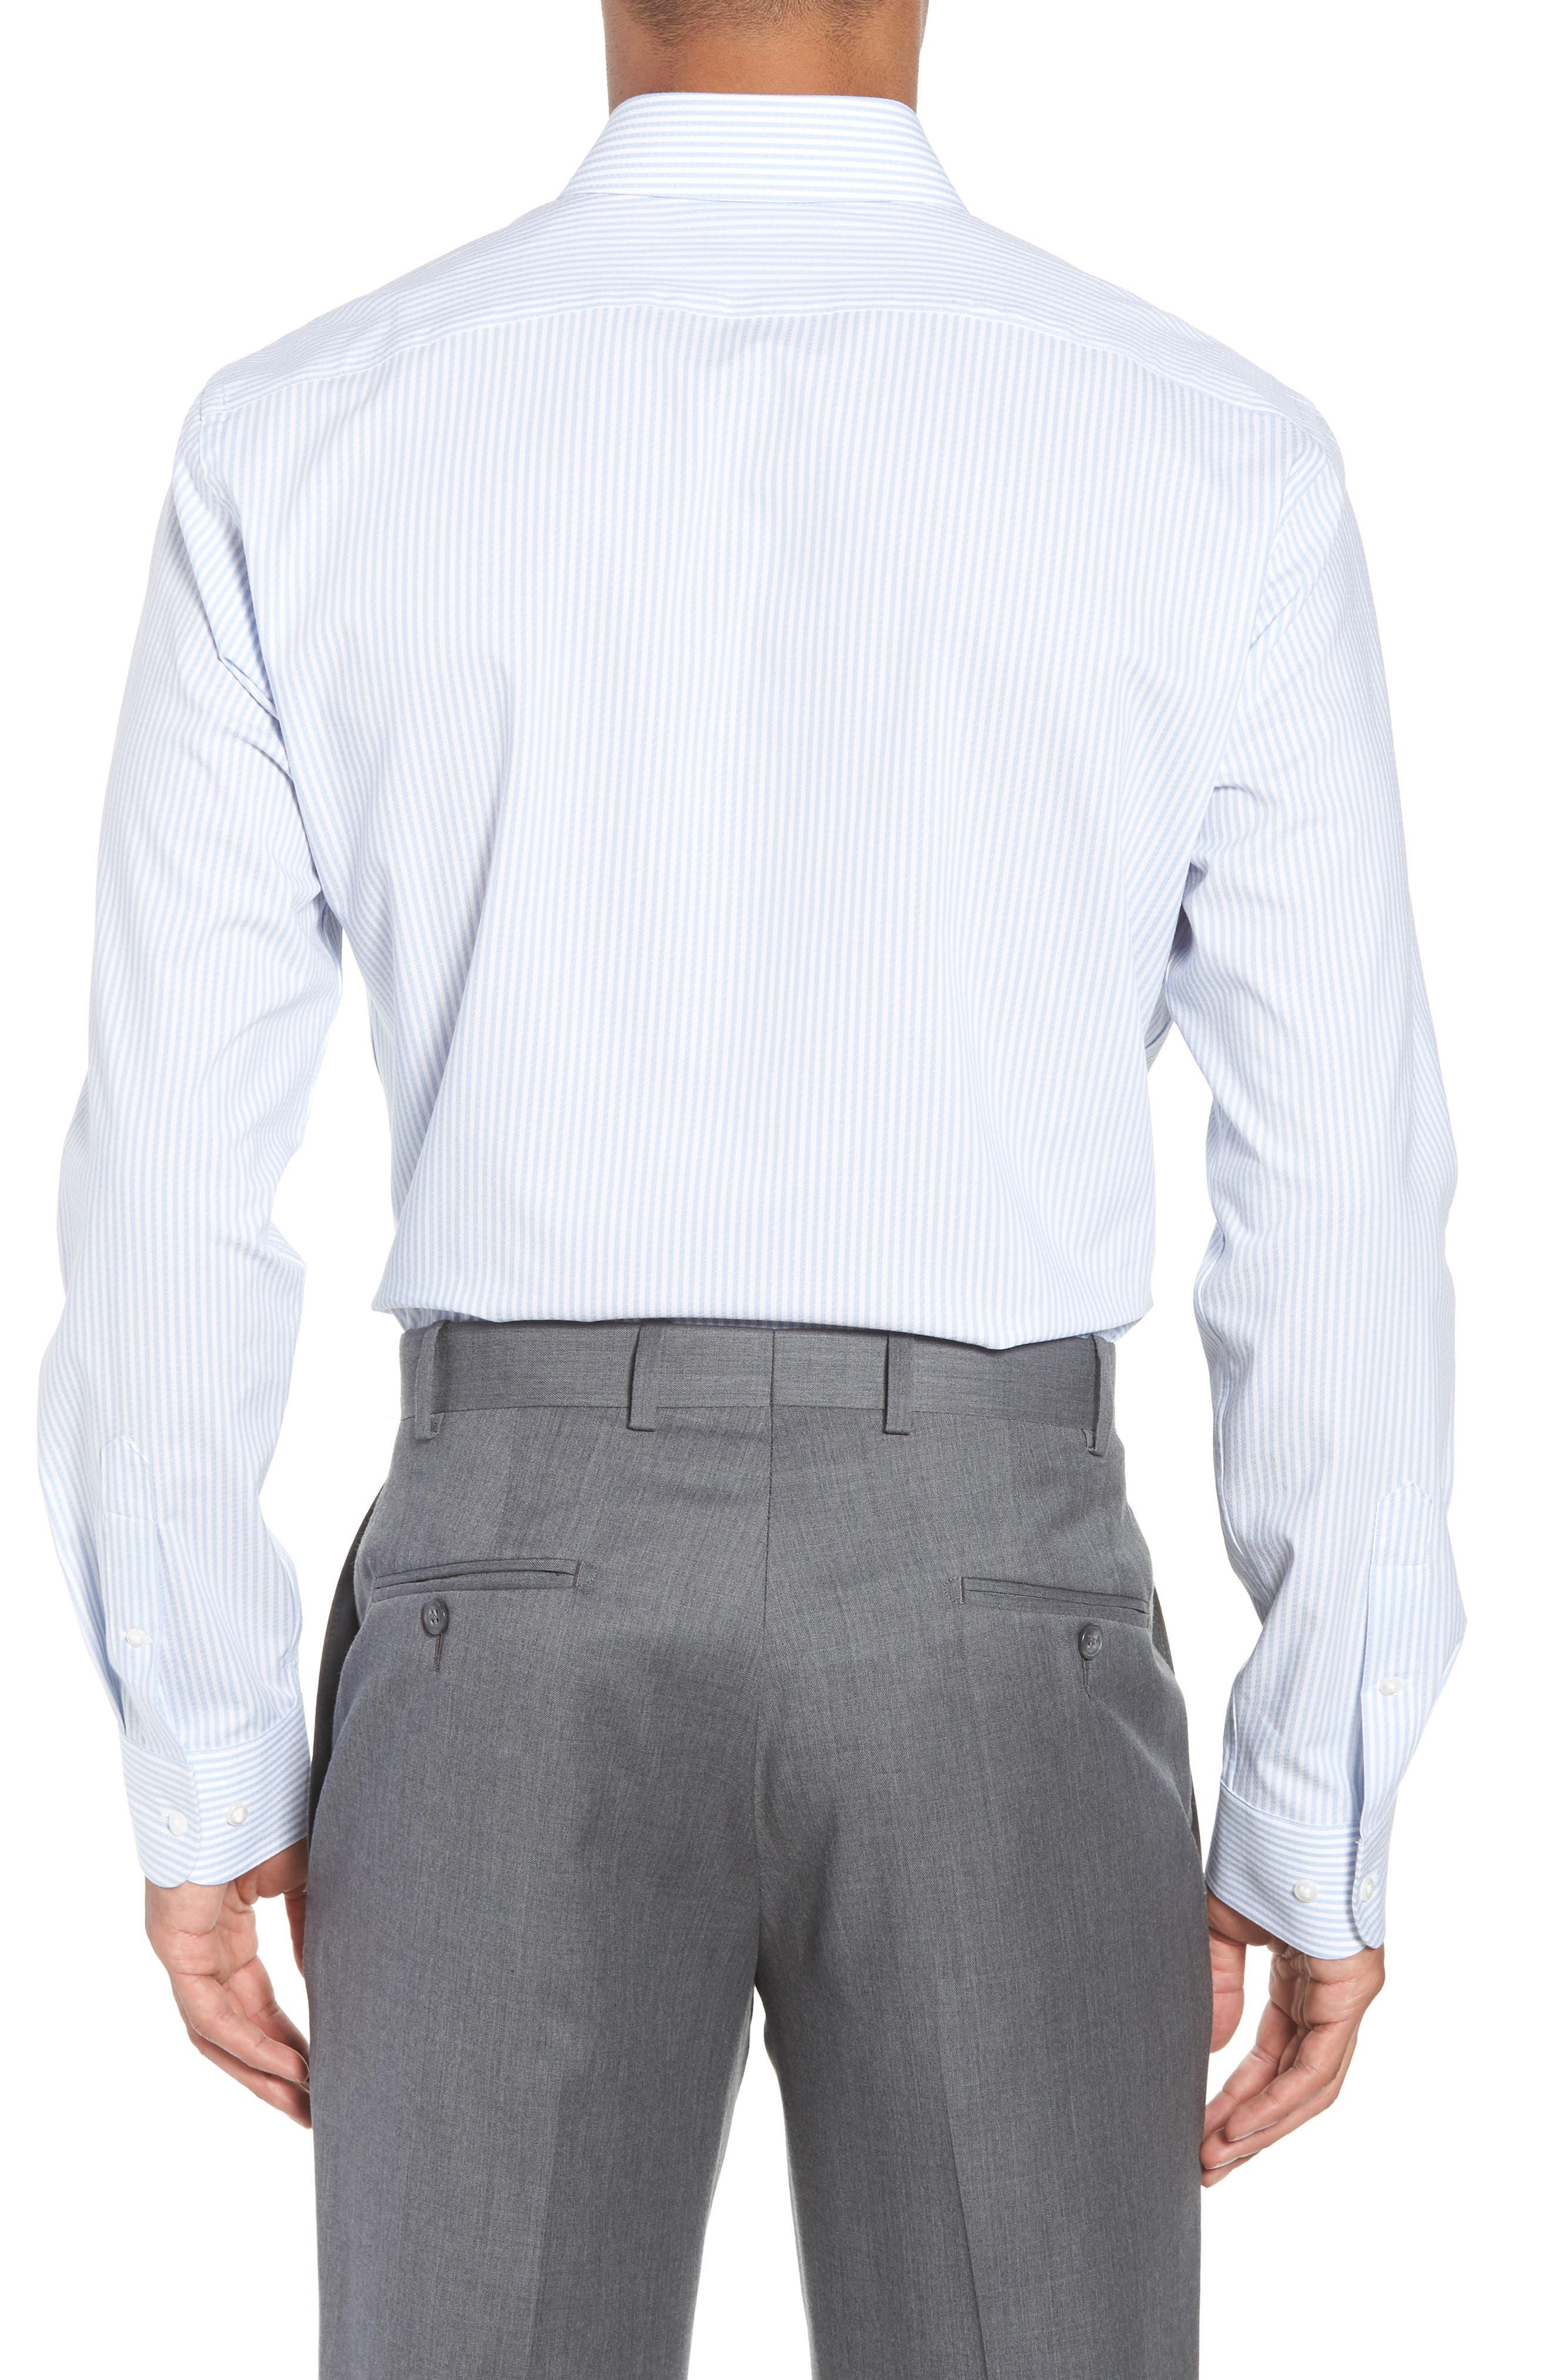 Tech-Smart Trim Fit Stripe Stretch Dress Shirt,                             Alternate thumbnail 3, color,                             Blue Brunnera